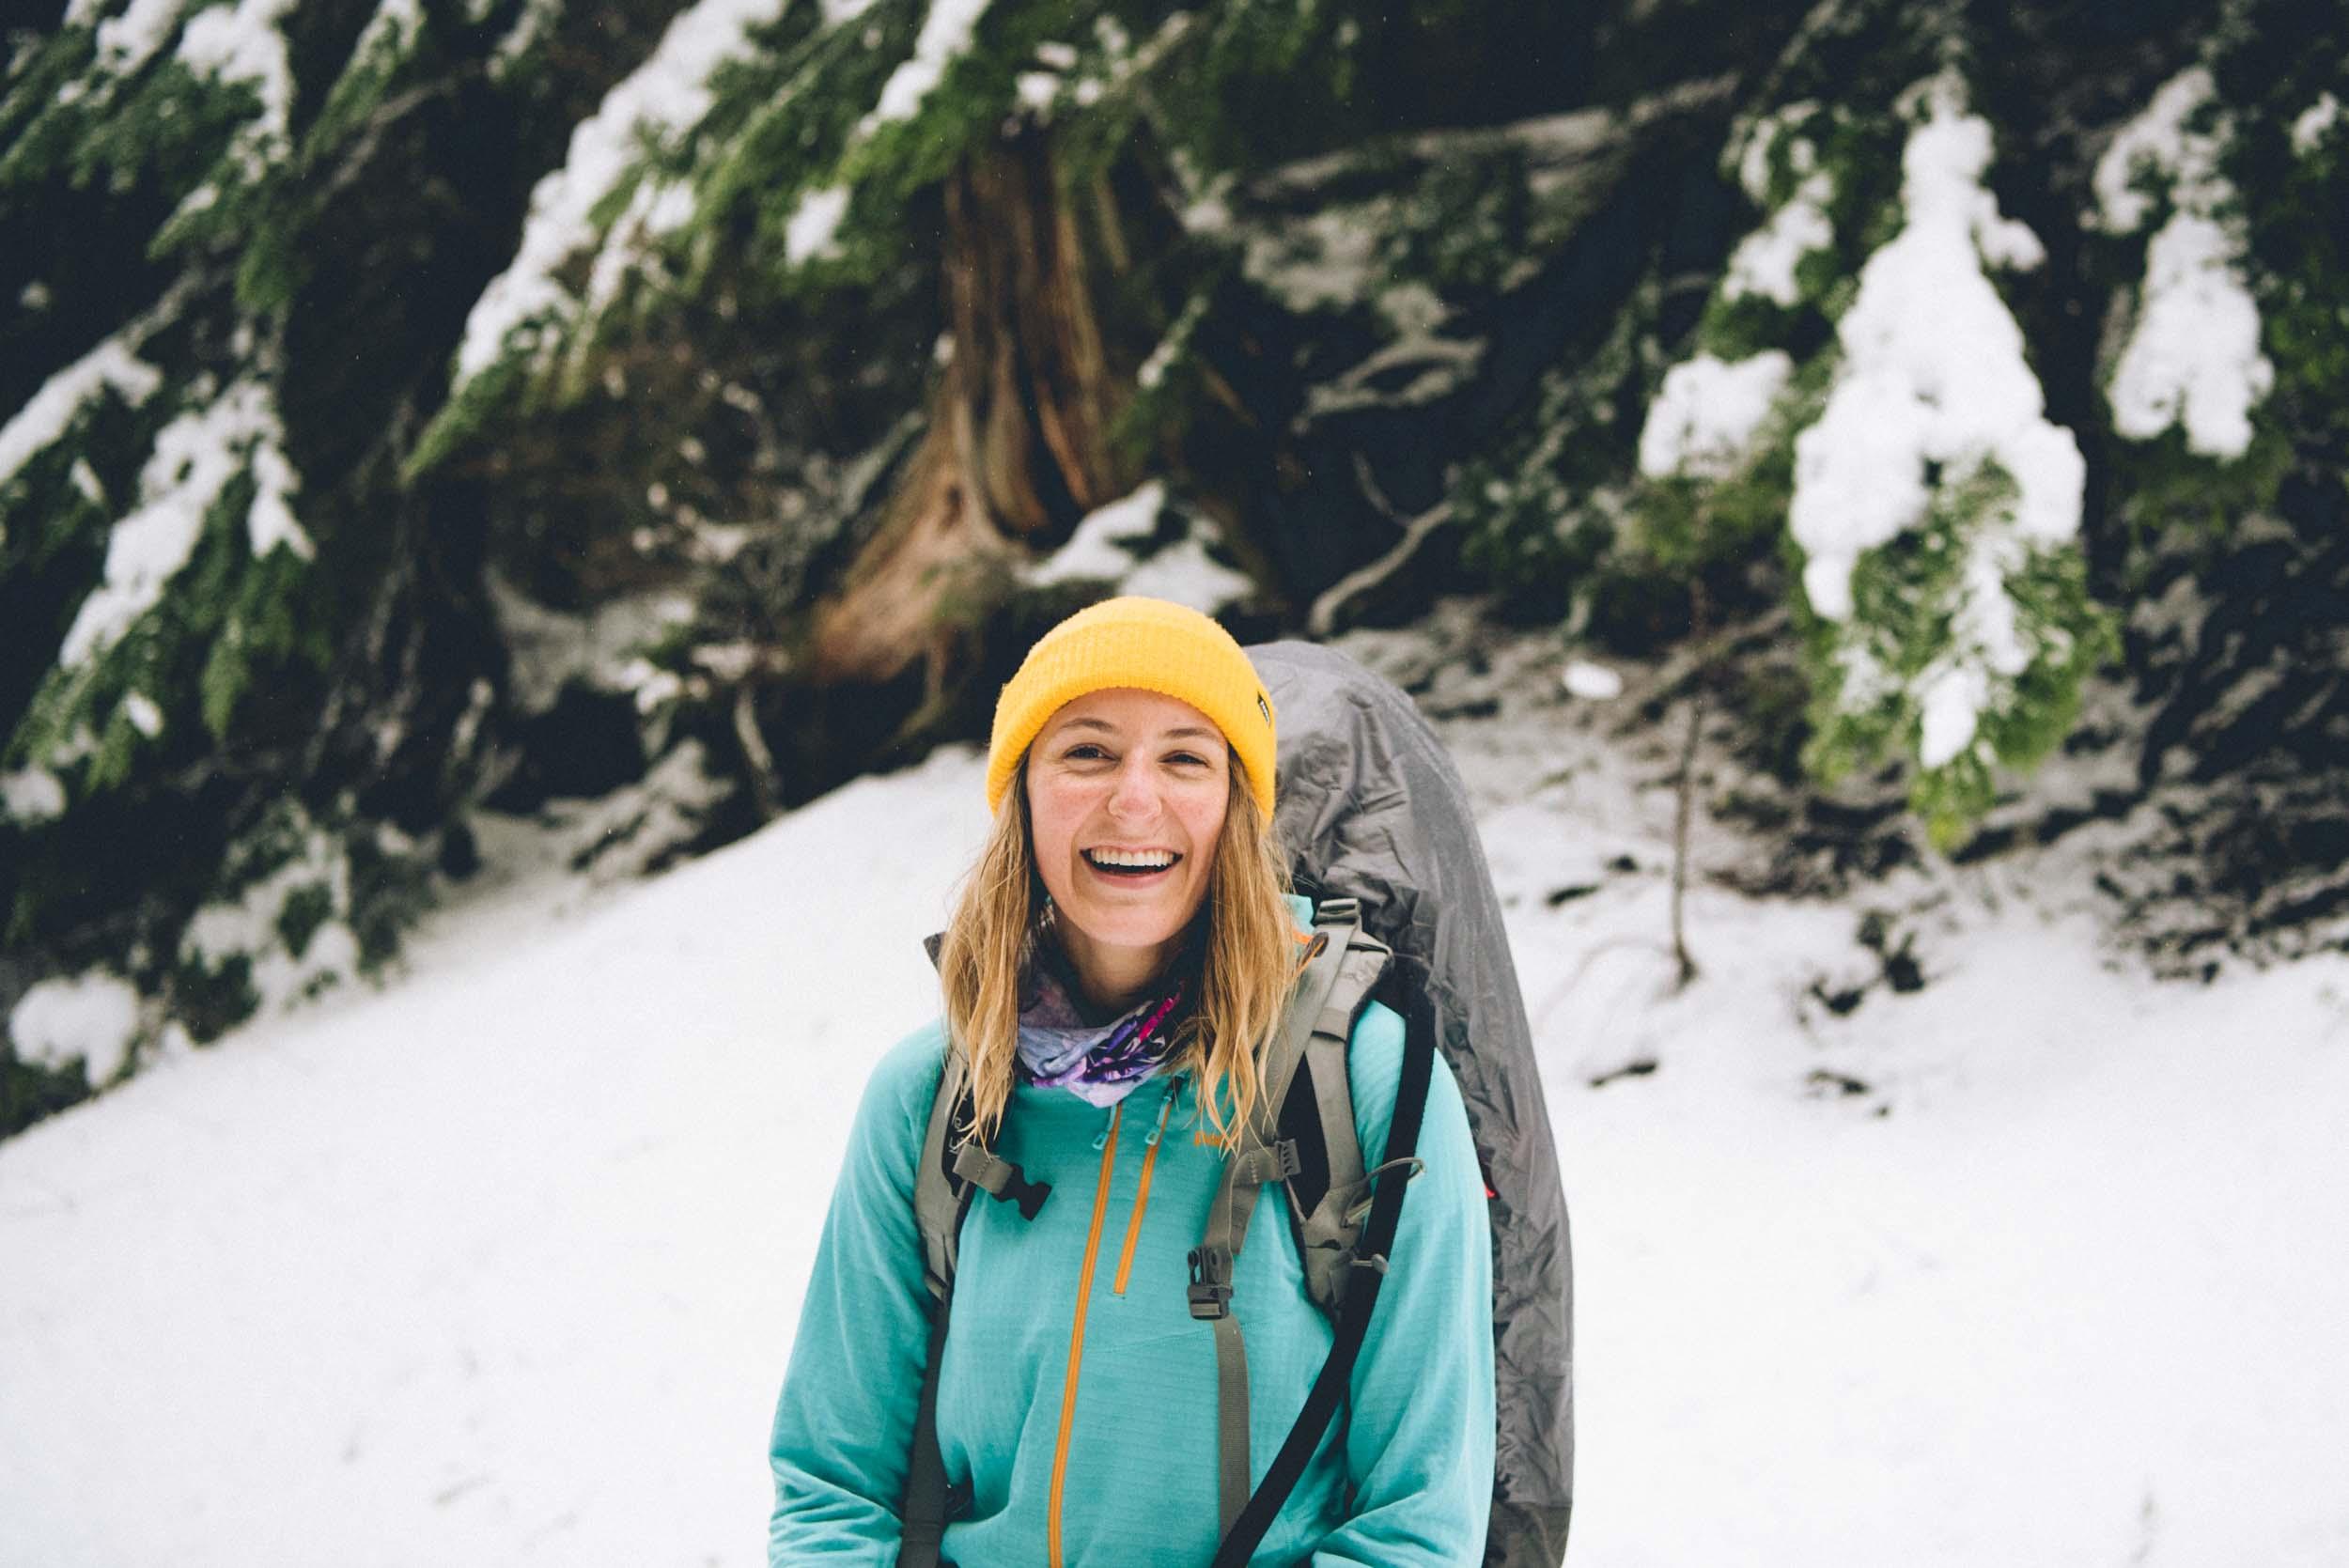 Miriam-Subbiah-Snow-Bowl-Hut-4.jpg